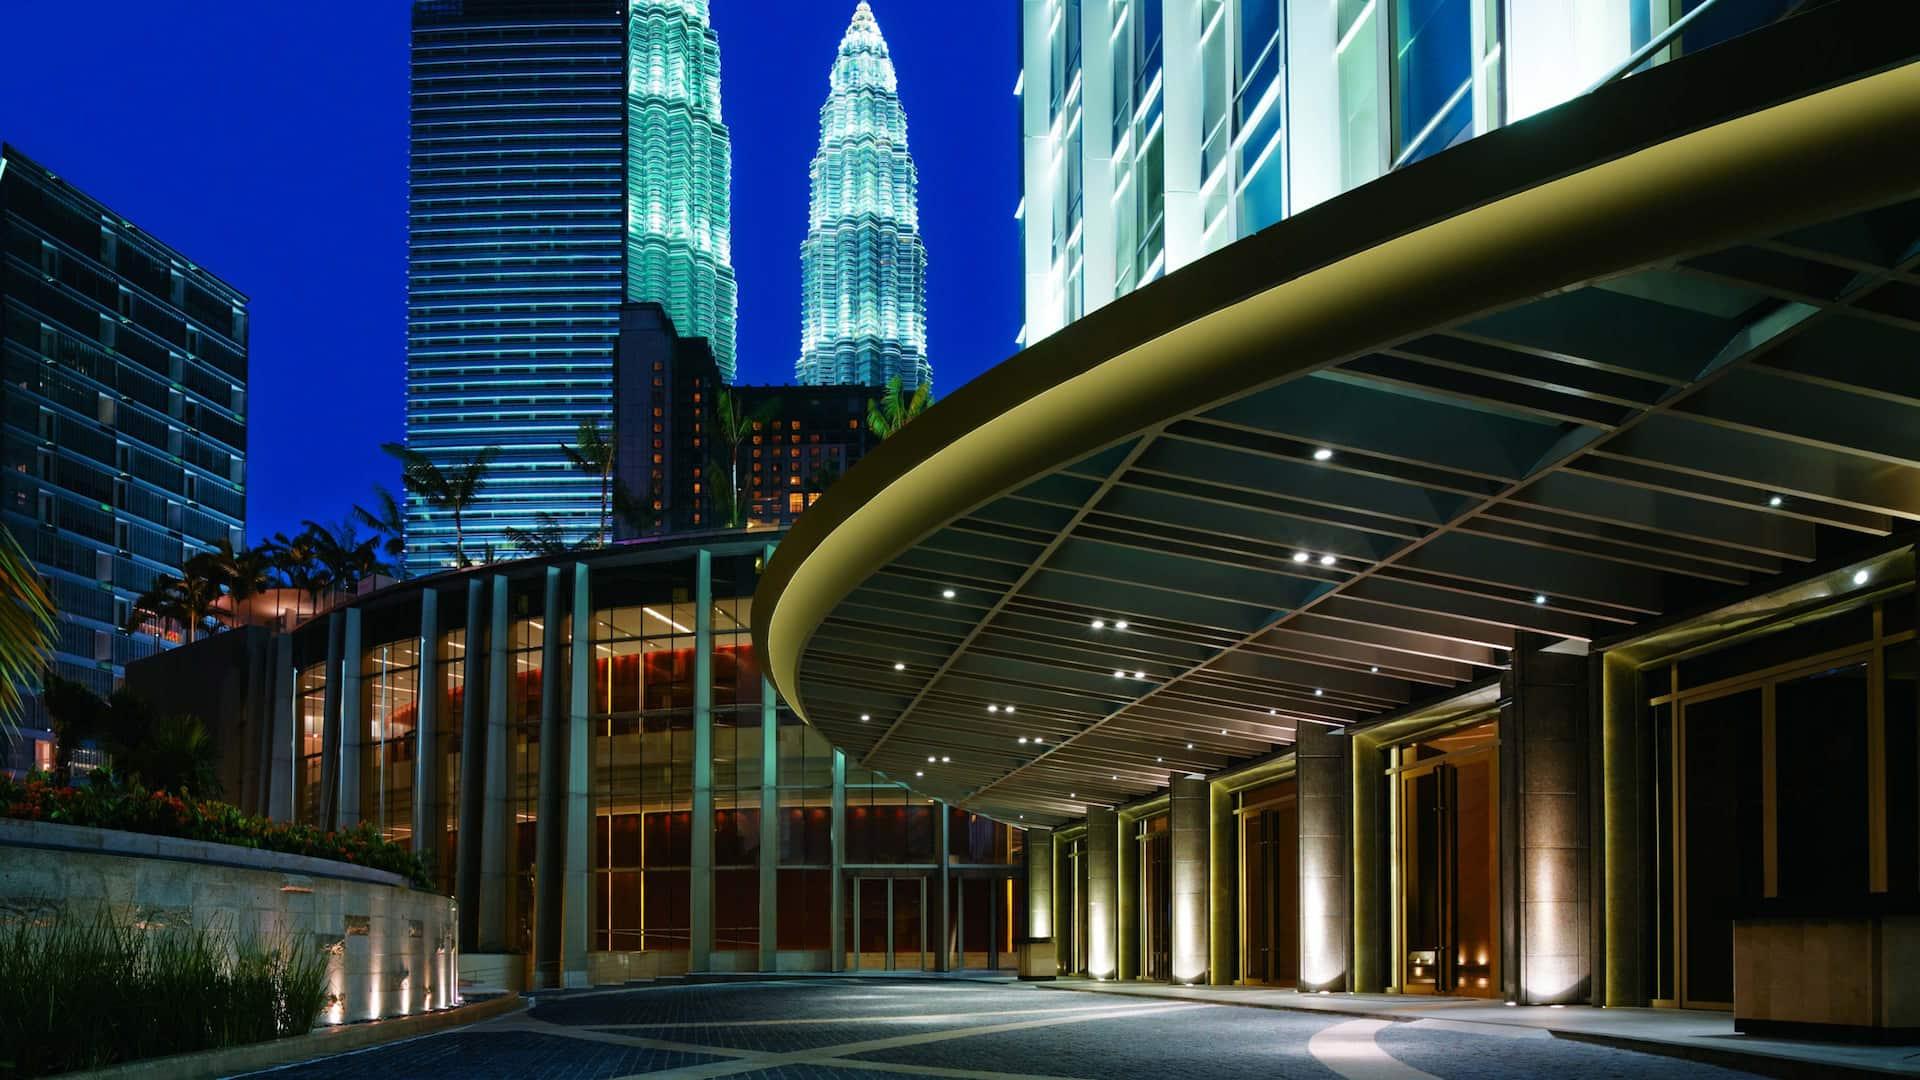 Hotels in Kuala Lumpur, Grand Hyatt Kuala Lumpur, Malaysia